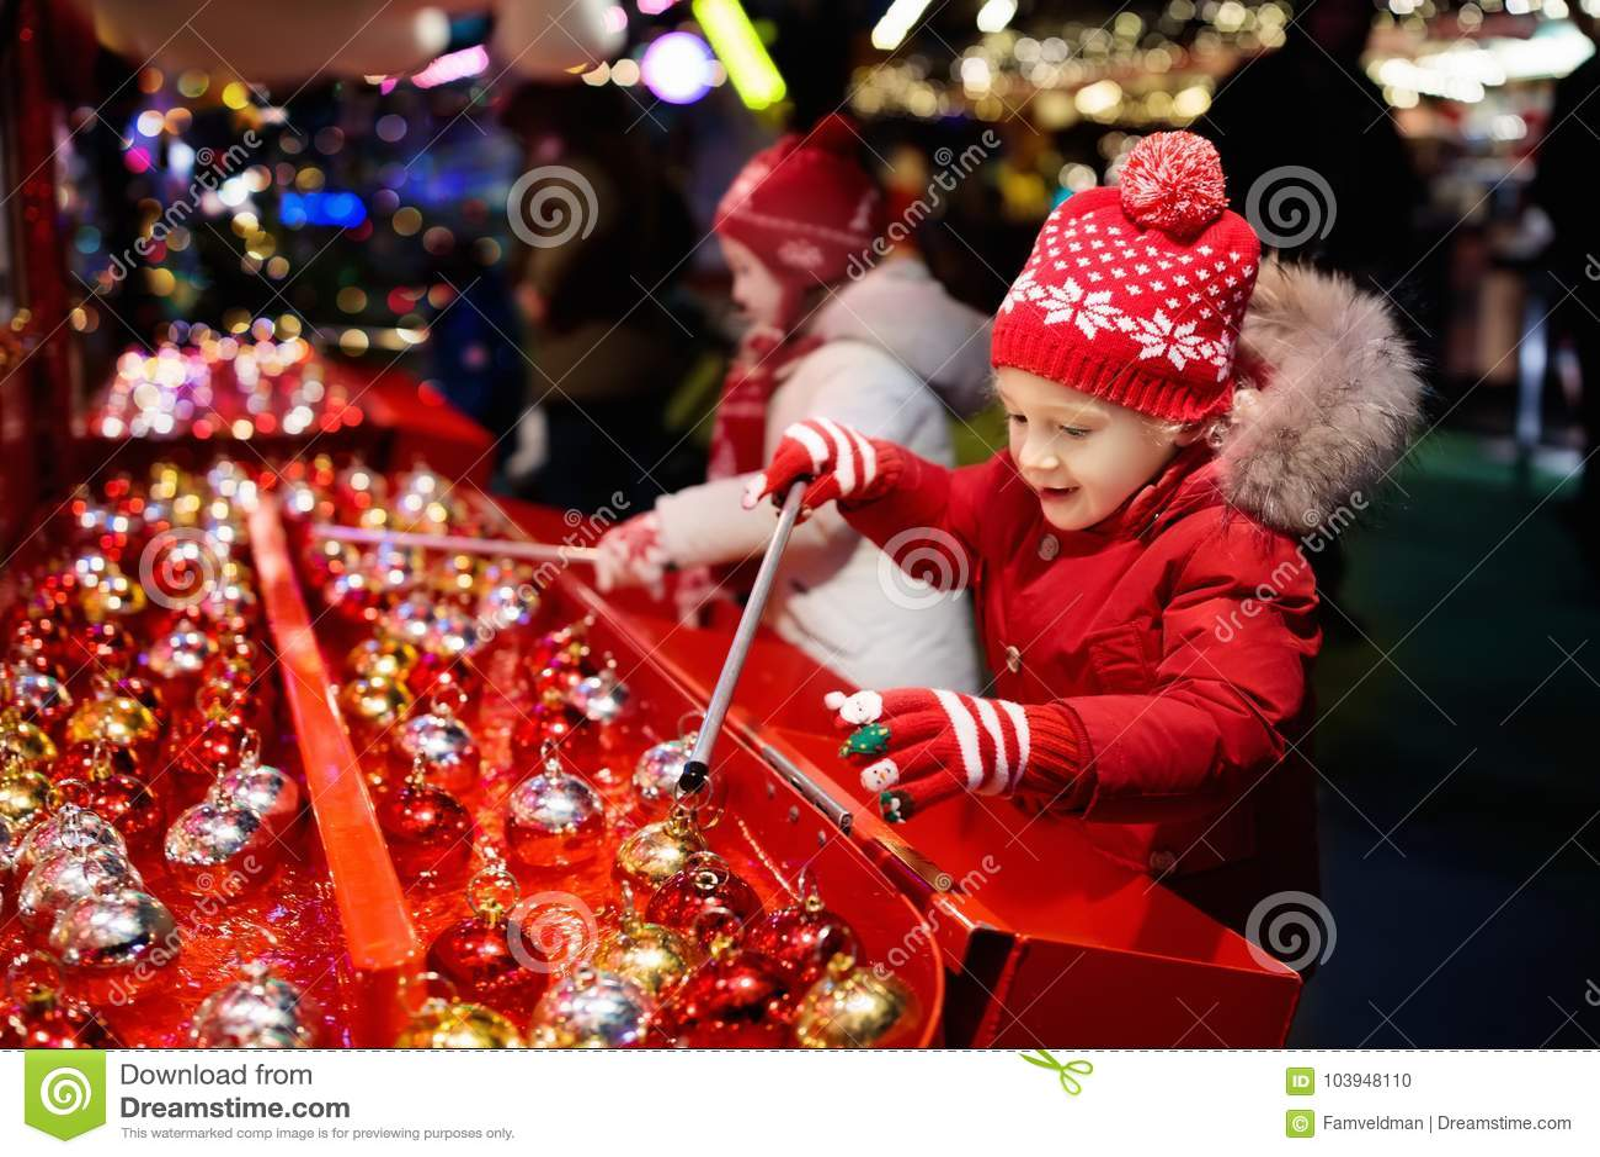 Kids At Christmas Fair. Children Shopping Xmas Gifts. Stock Photo ...